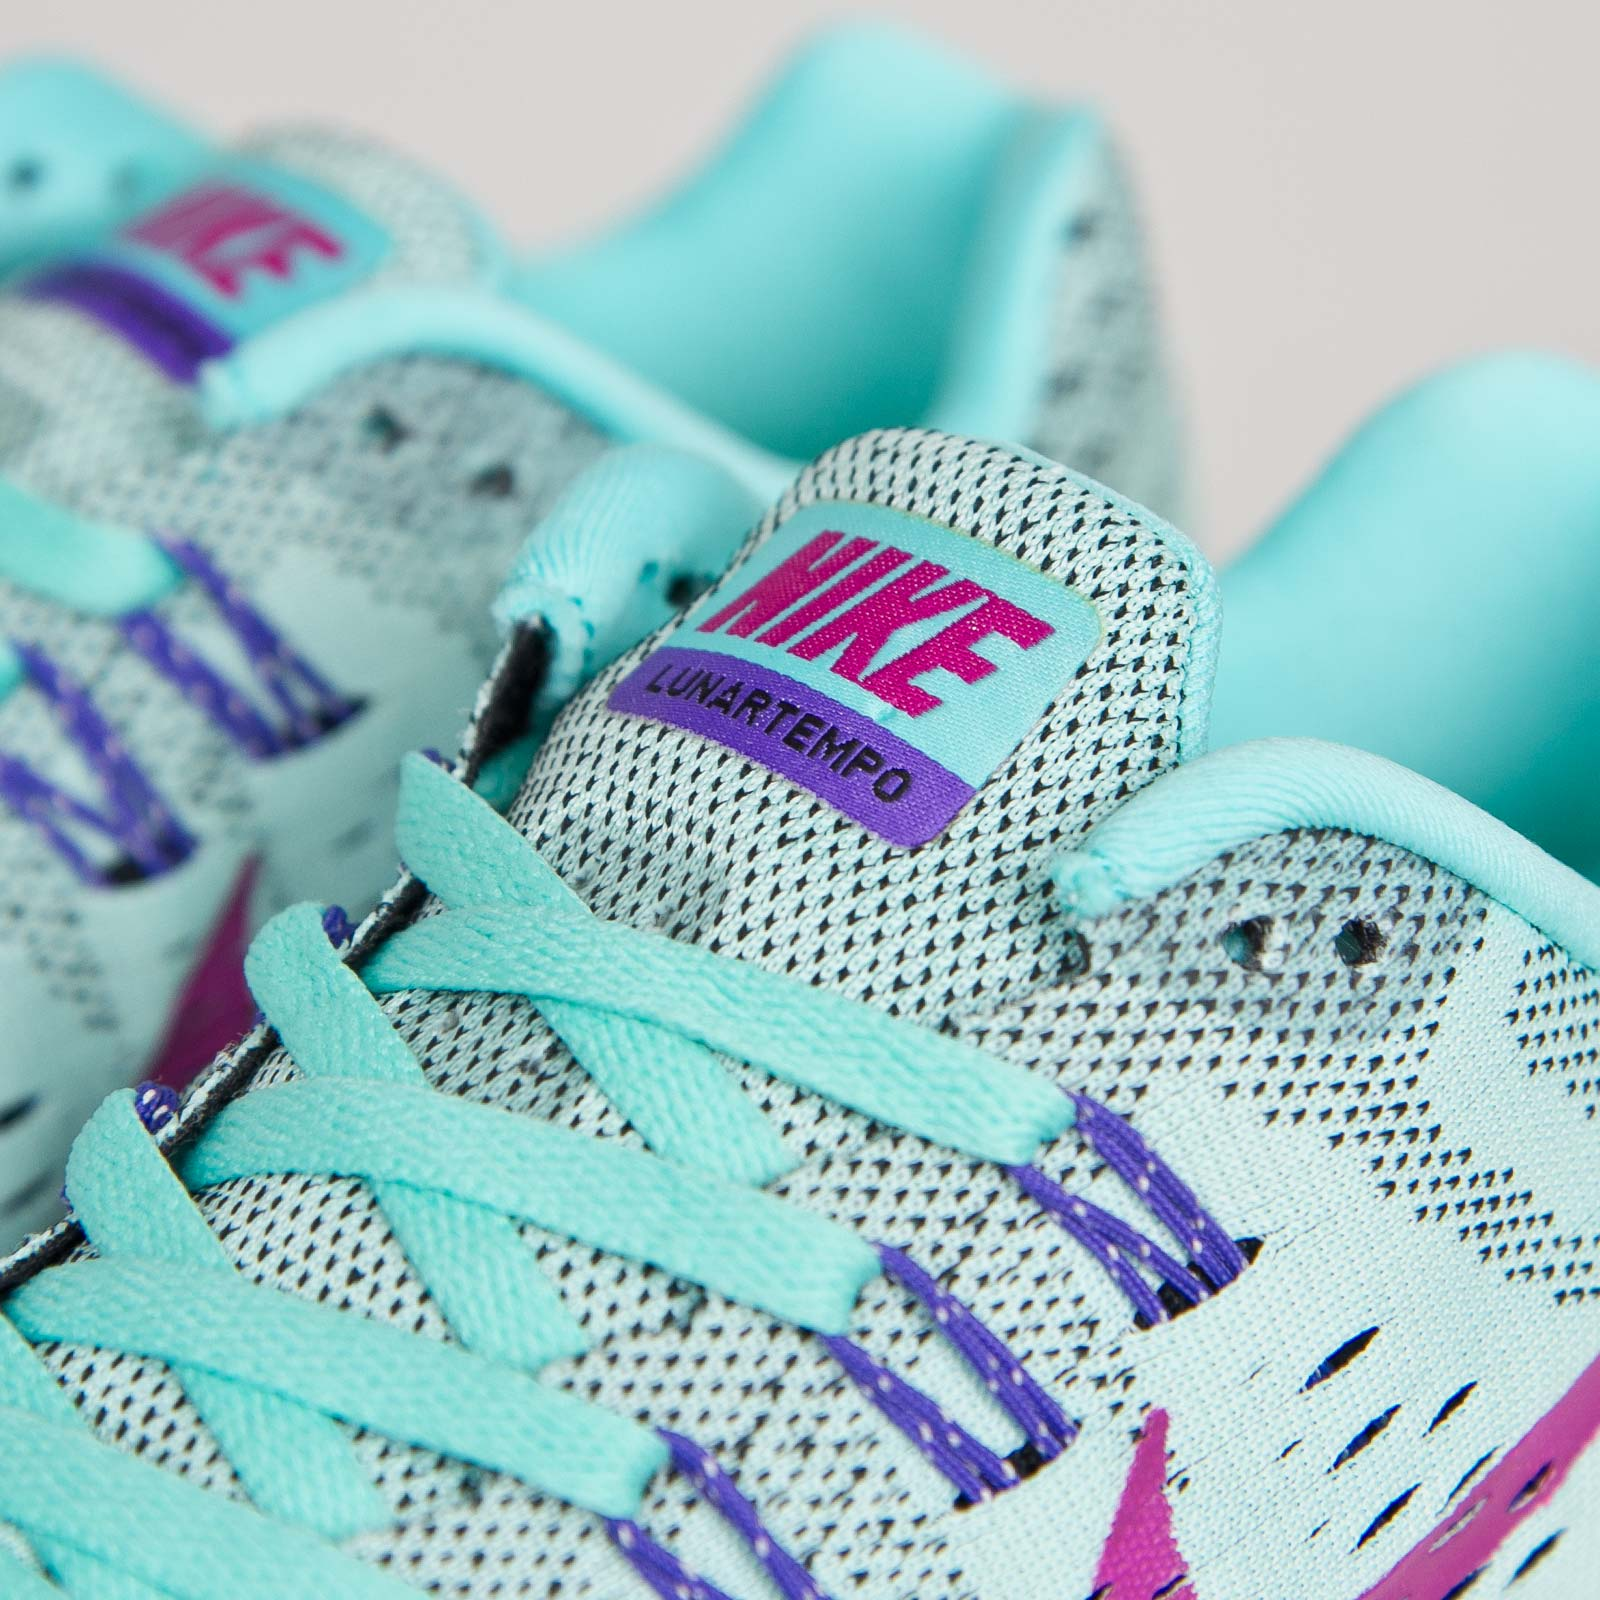 c01b4ff6b3ce Nike Wmns Lunartempo - 705462-401 - Sneakersnstuff